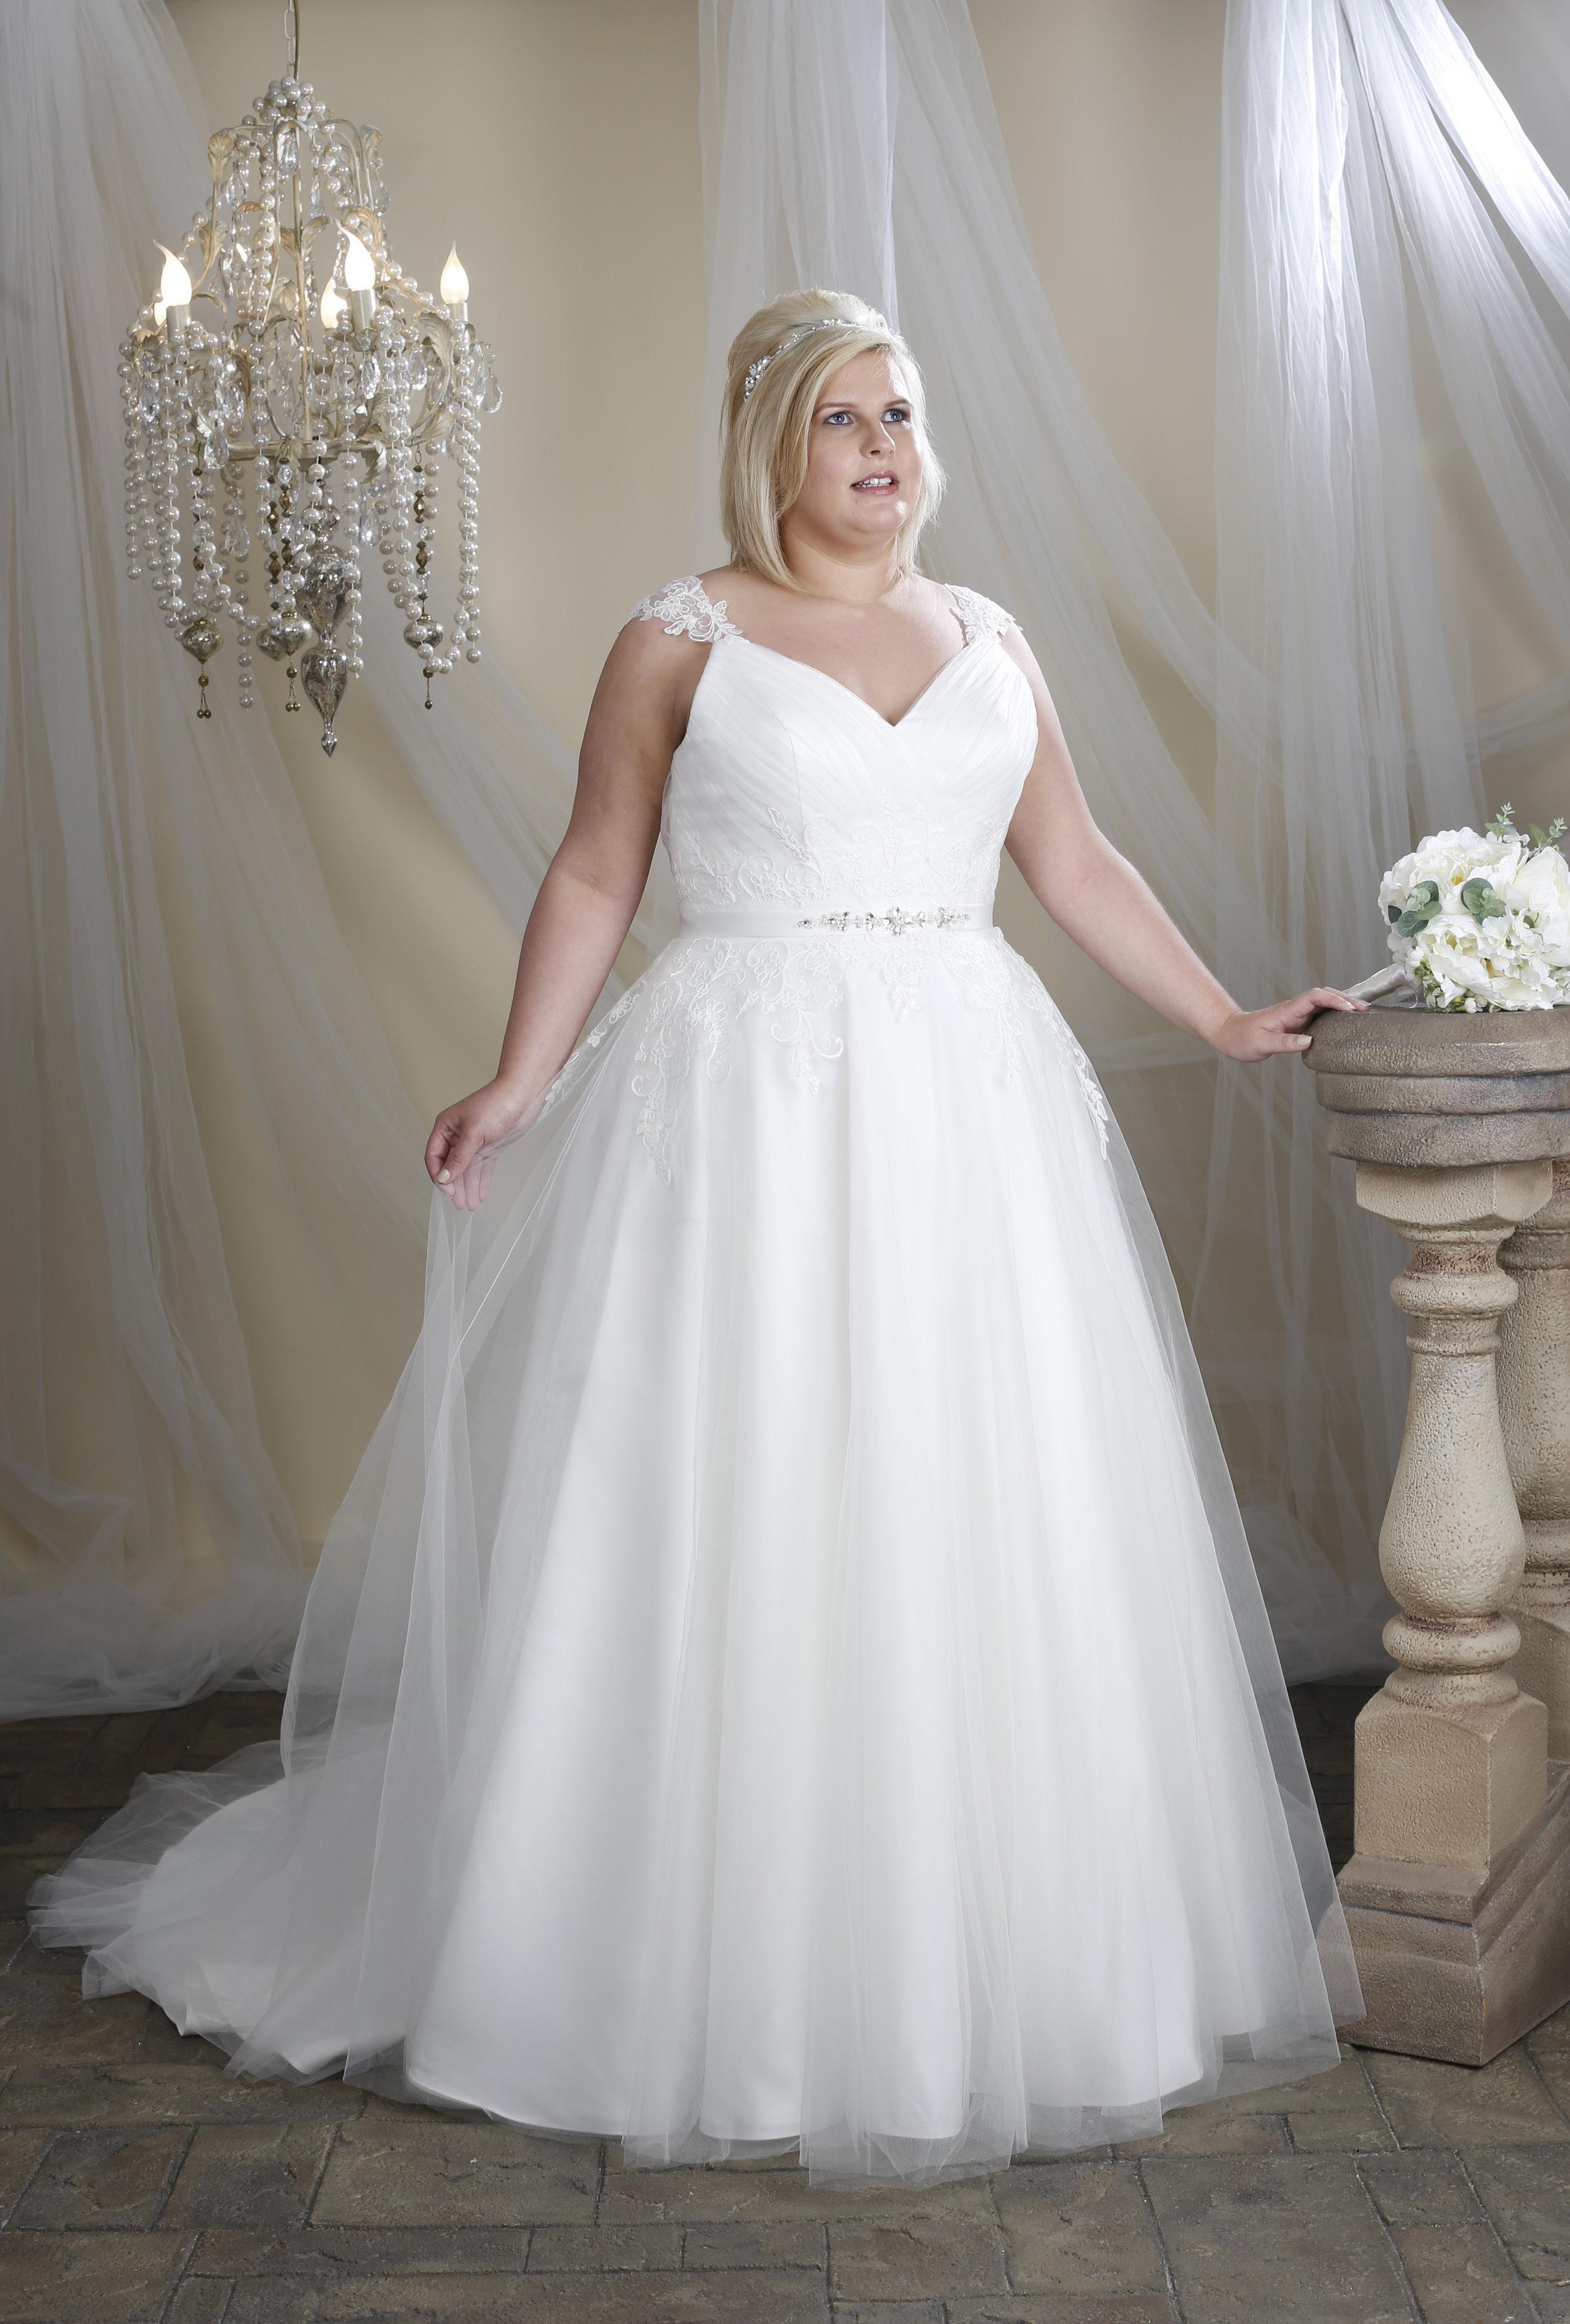 A curvy model wearing a plus size Hilary Morgan wedding dress